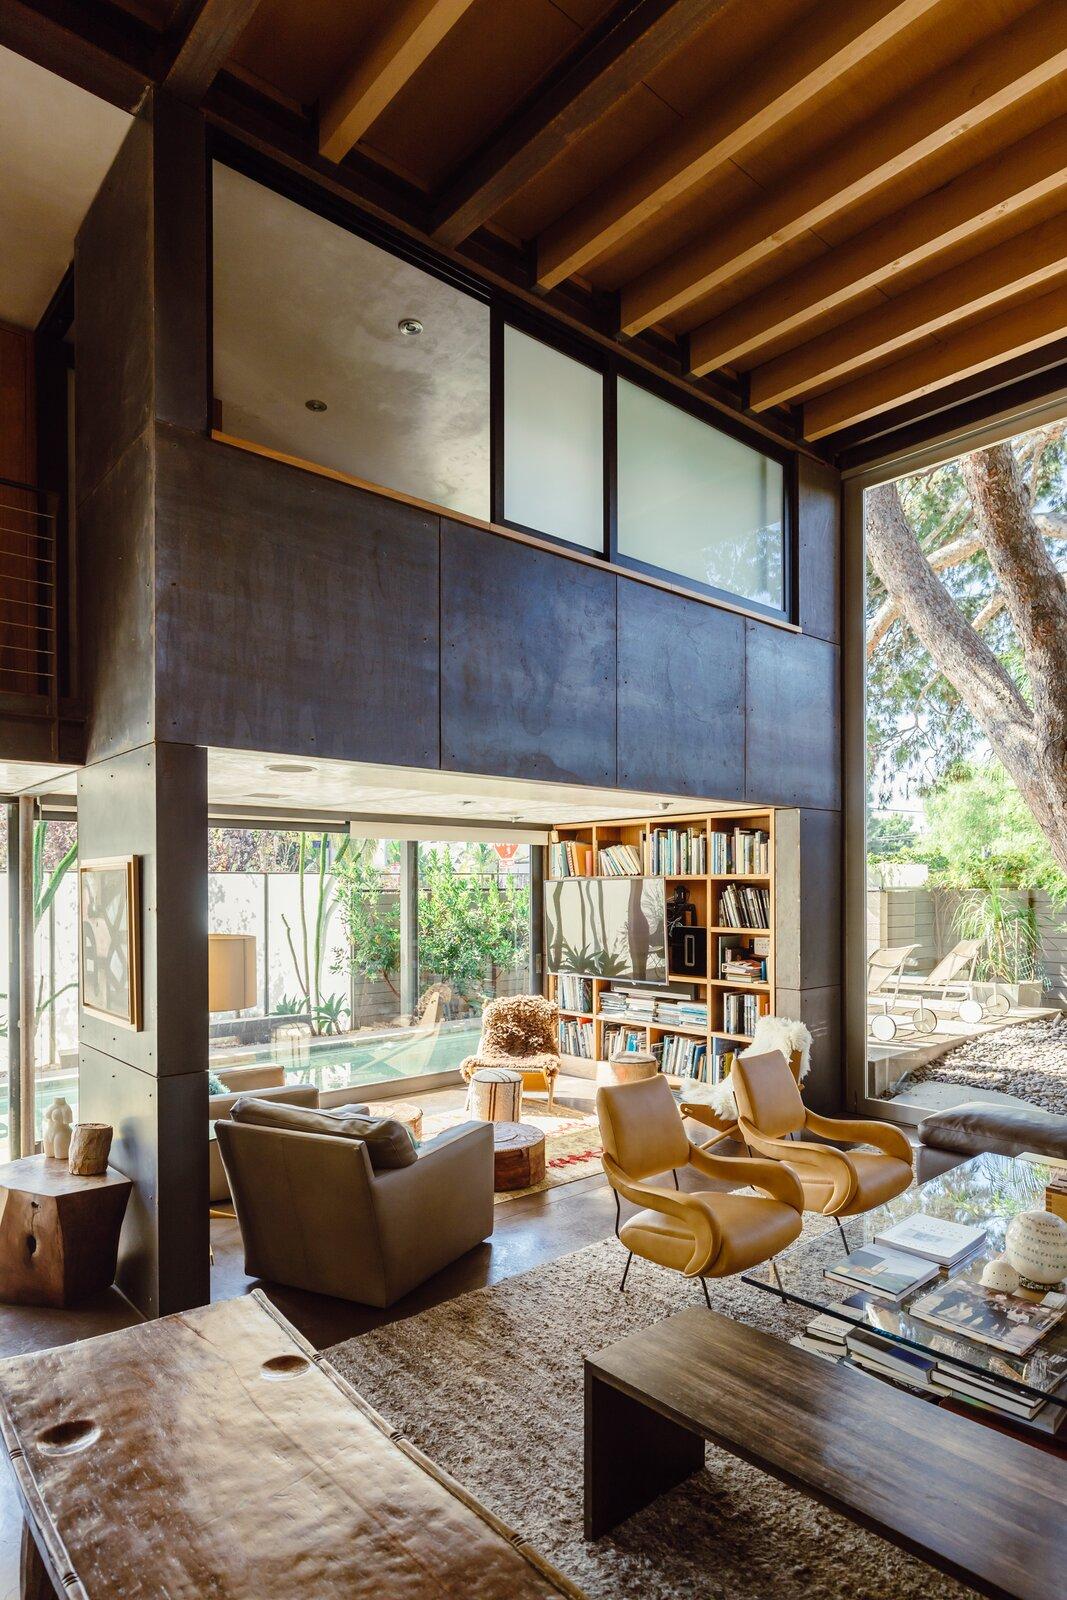 700 Palms living room